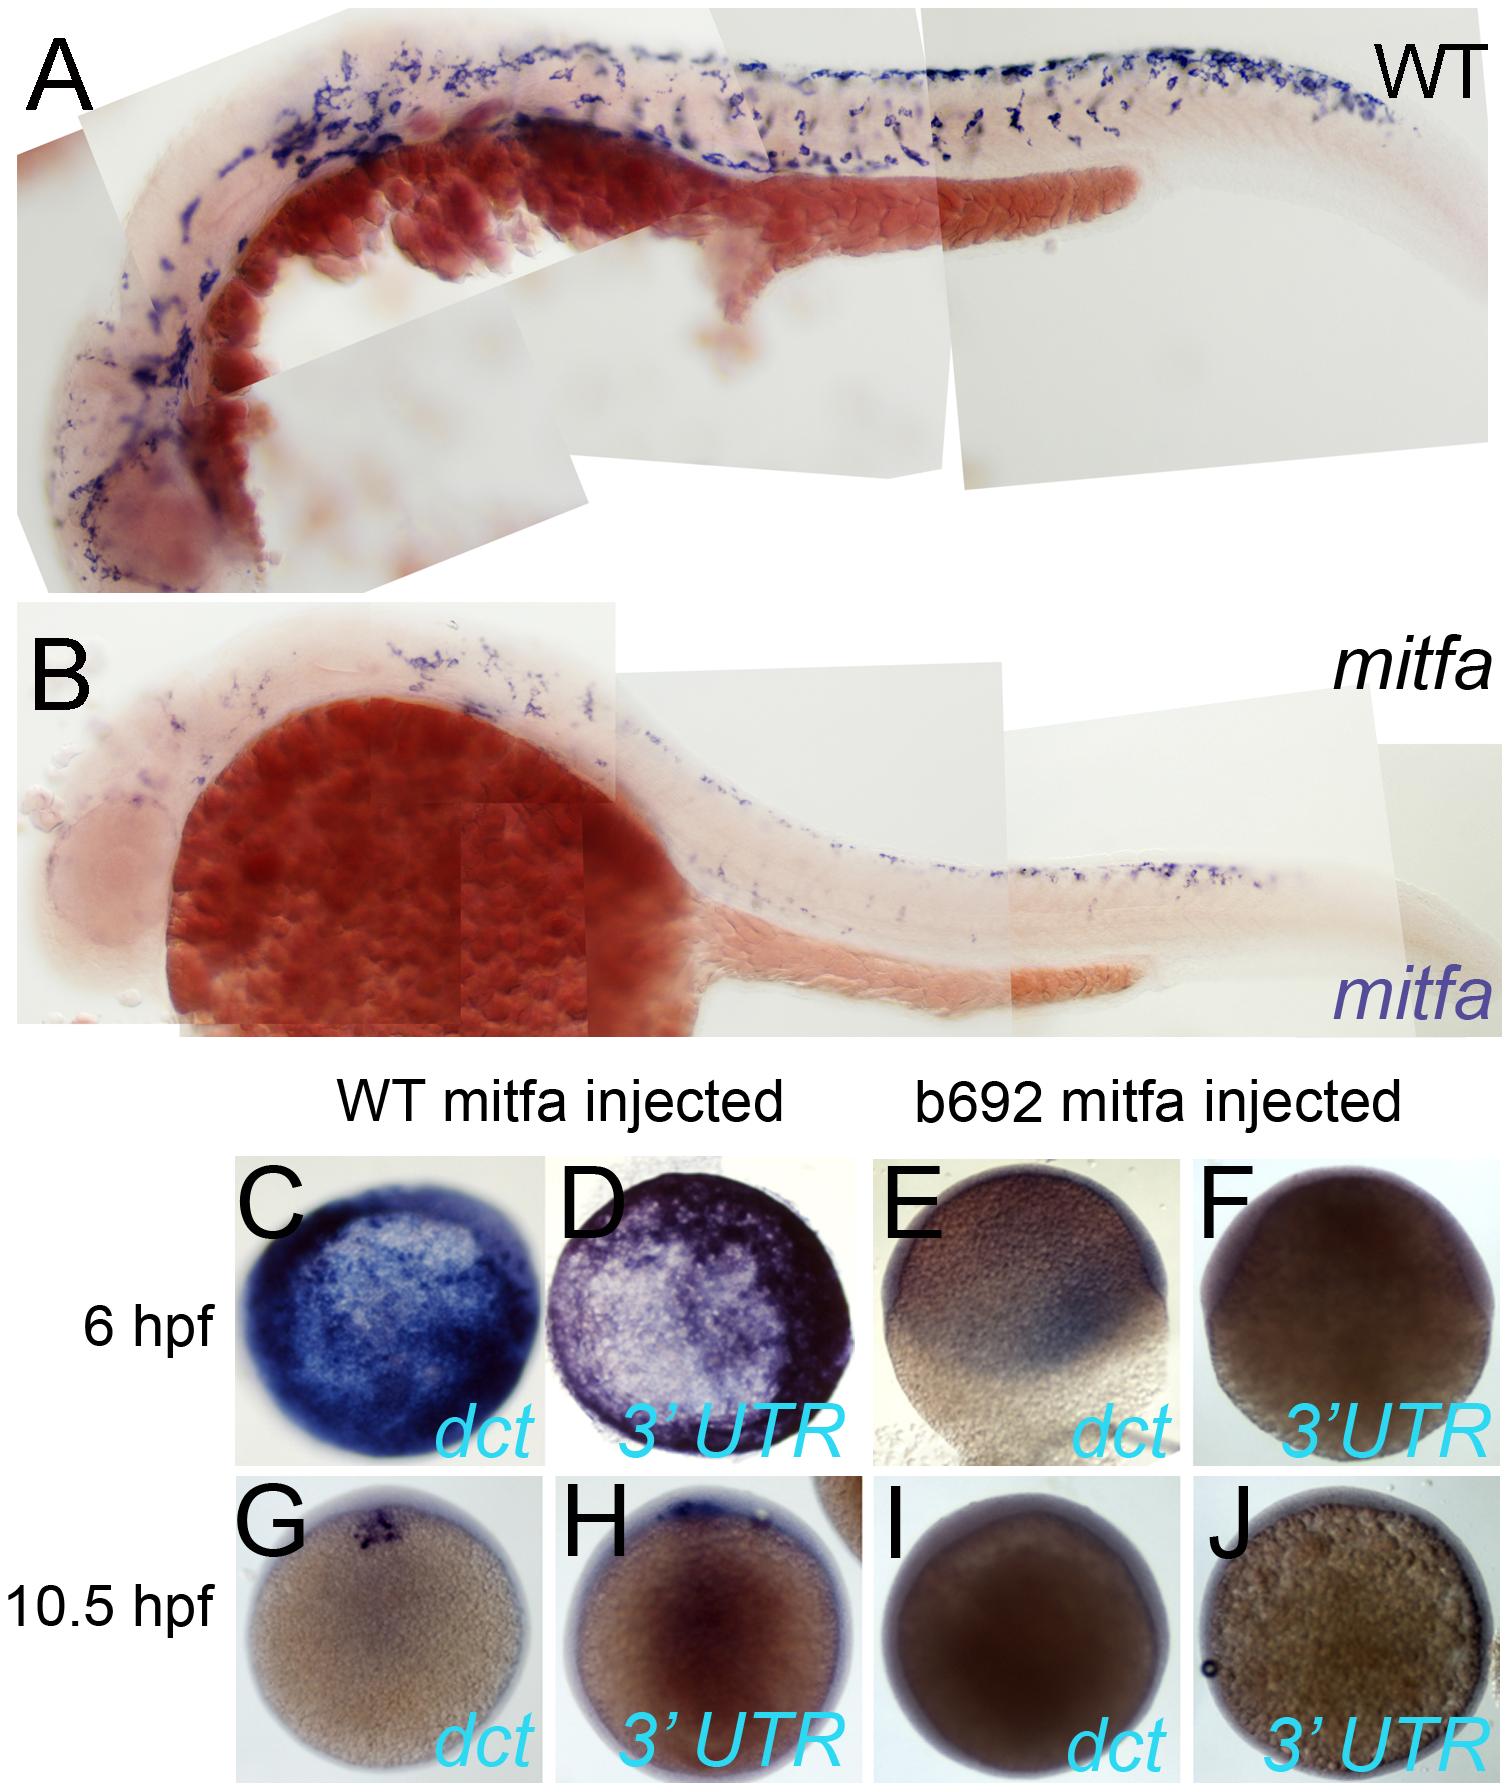 Mitfa-dependent maintenance of <i>mitfa</i> expression.